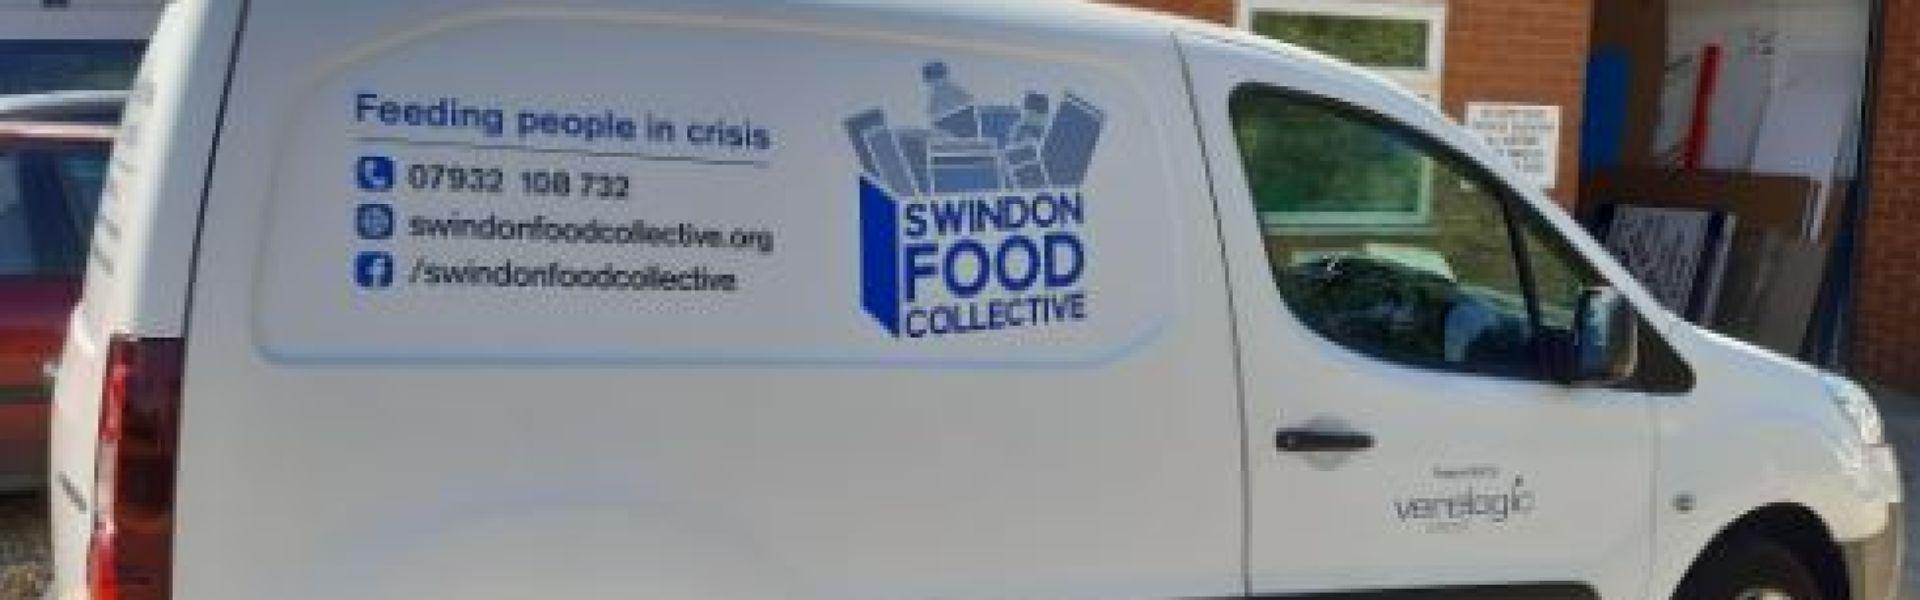 Swindon Food Collective